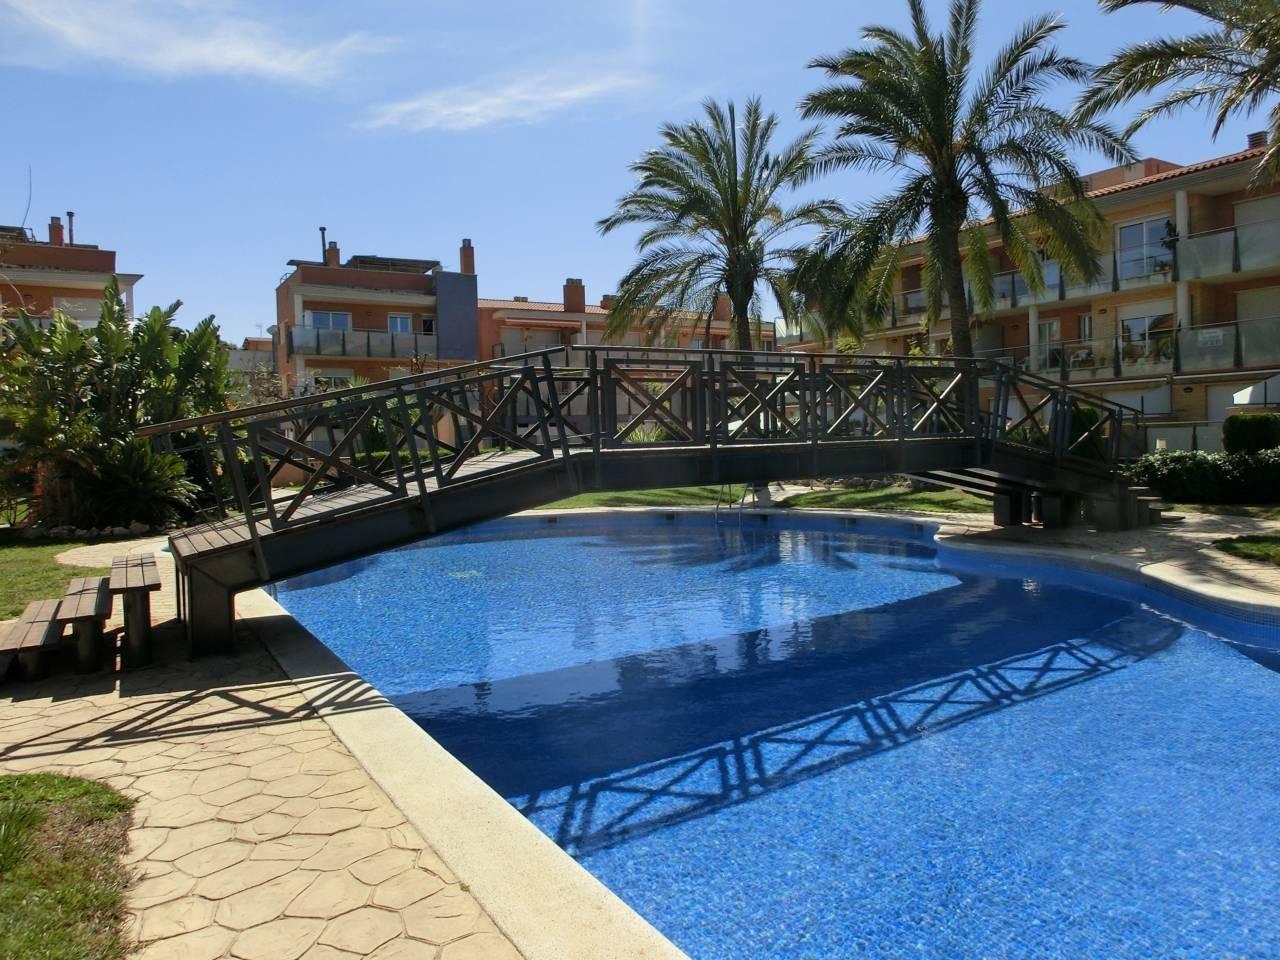 Alquiler de Temporada Piso  Calle castell d´almansa, 54. Conjunto residencial espectacular. el complejo dispone de 3 pisc